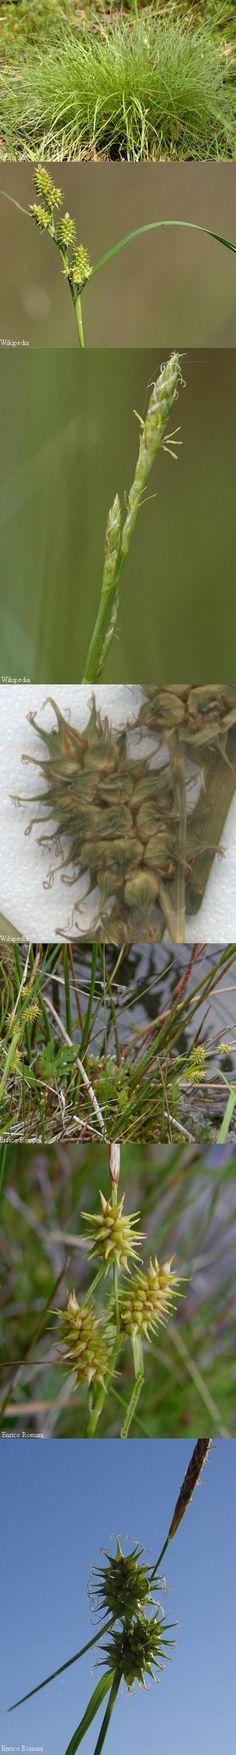 Geelgroene zegge - Carex oederi subsp. oedocarpa